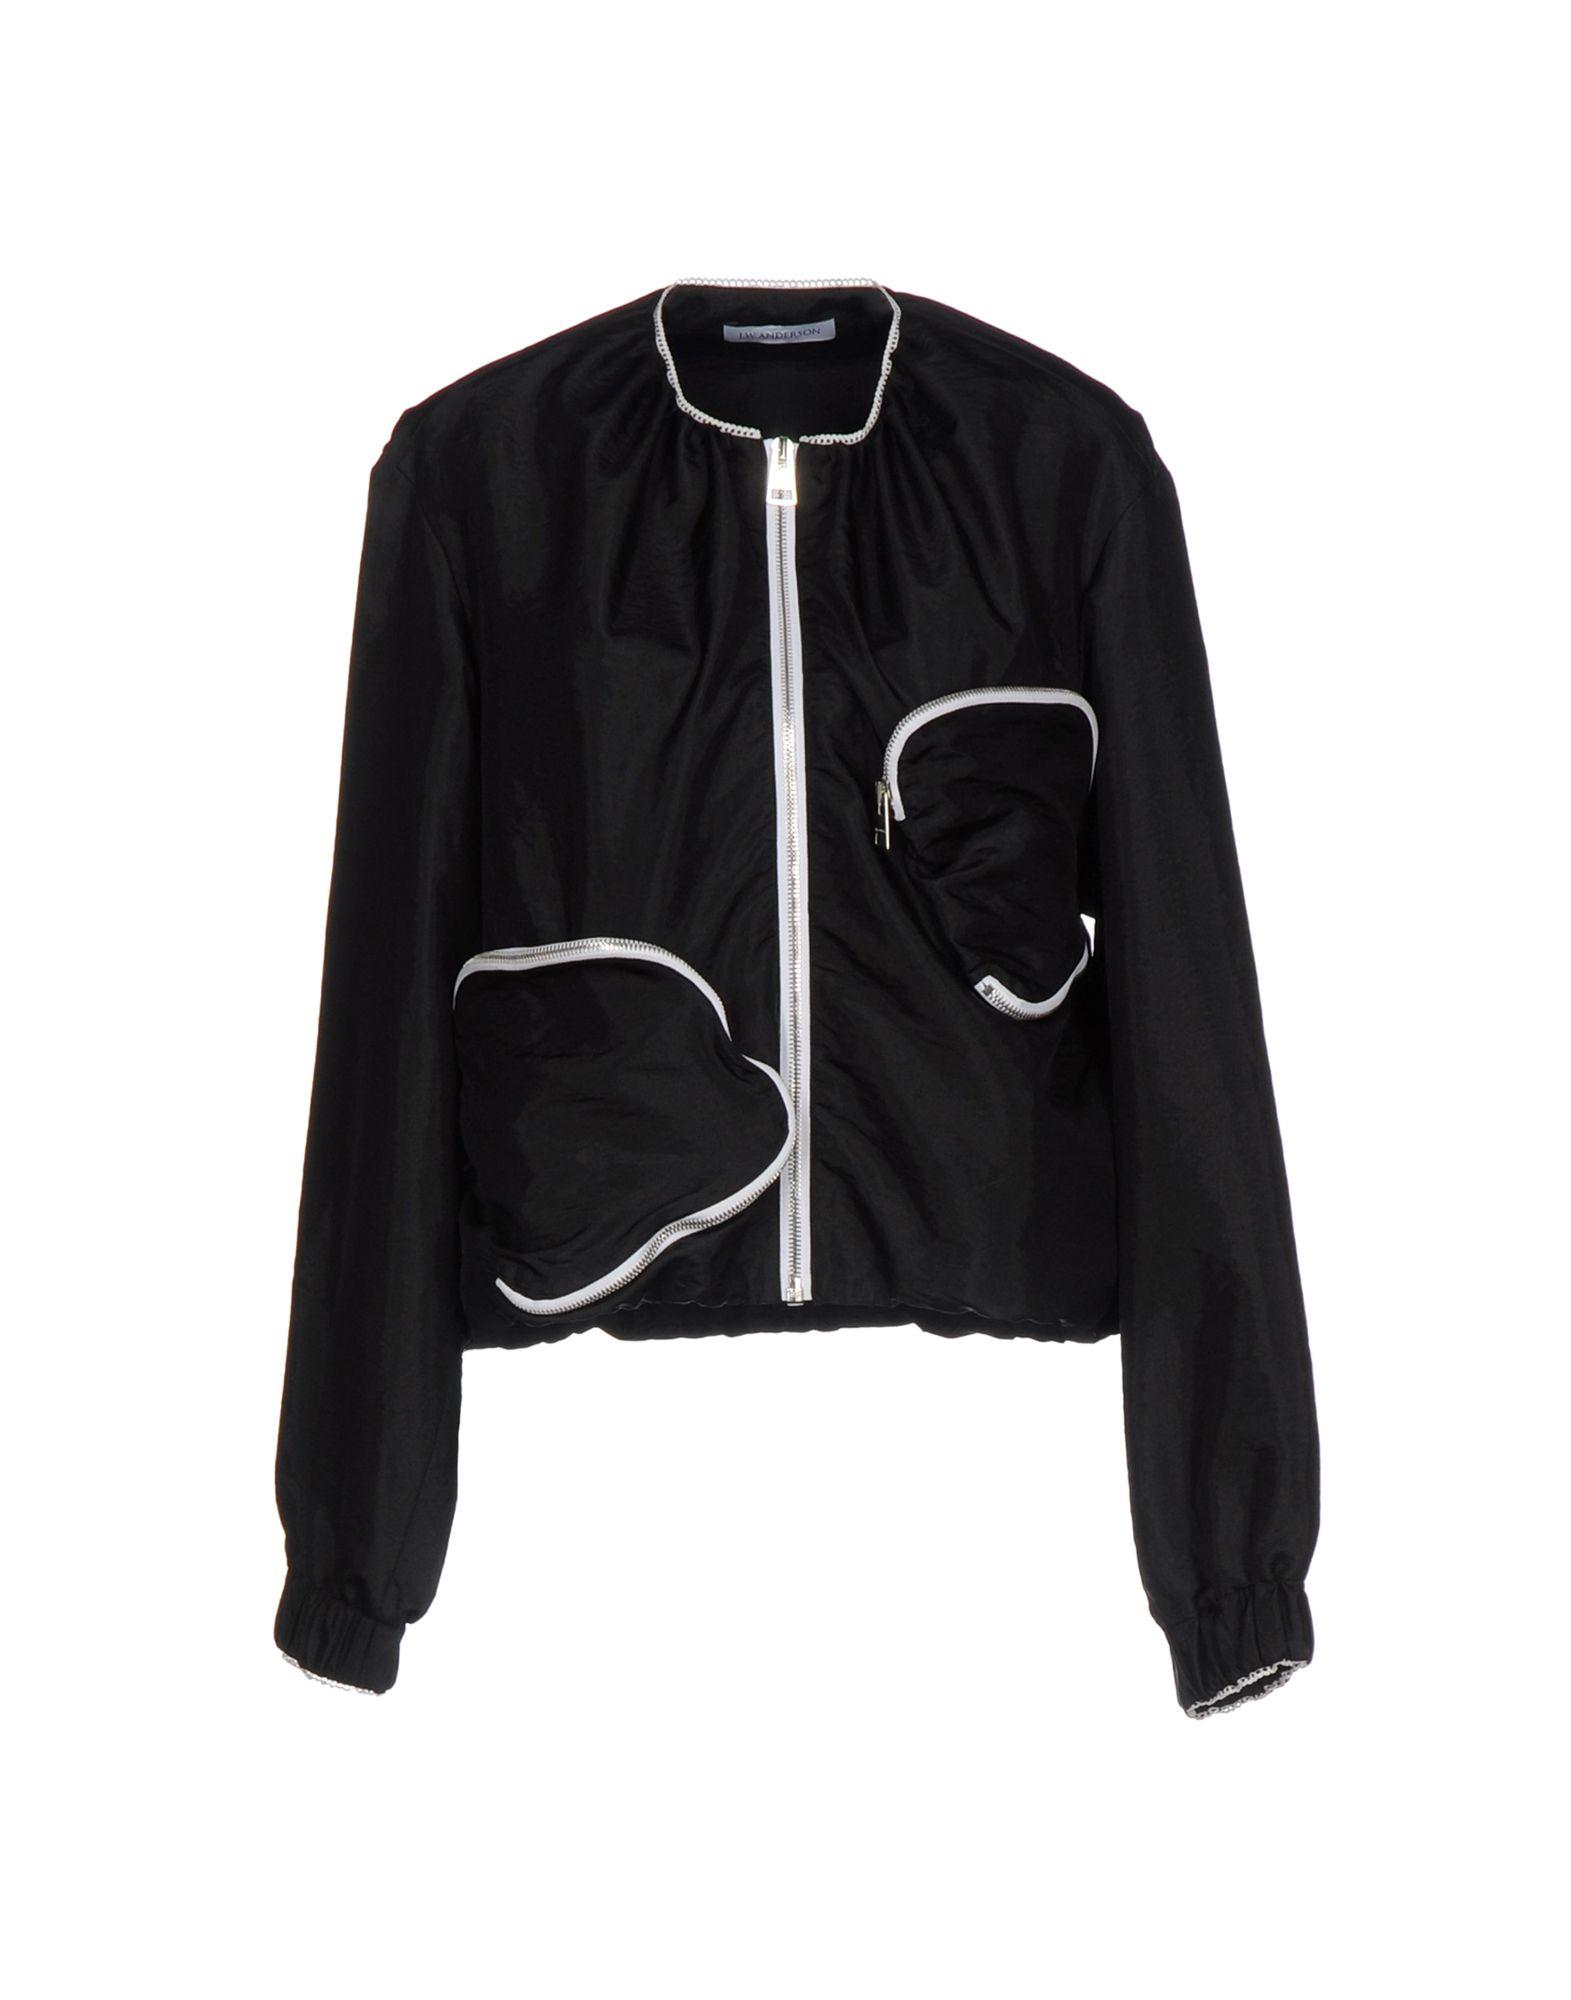 Michael kors ladies coats and jackets